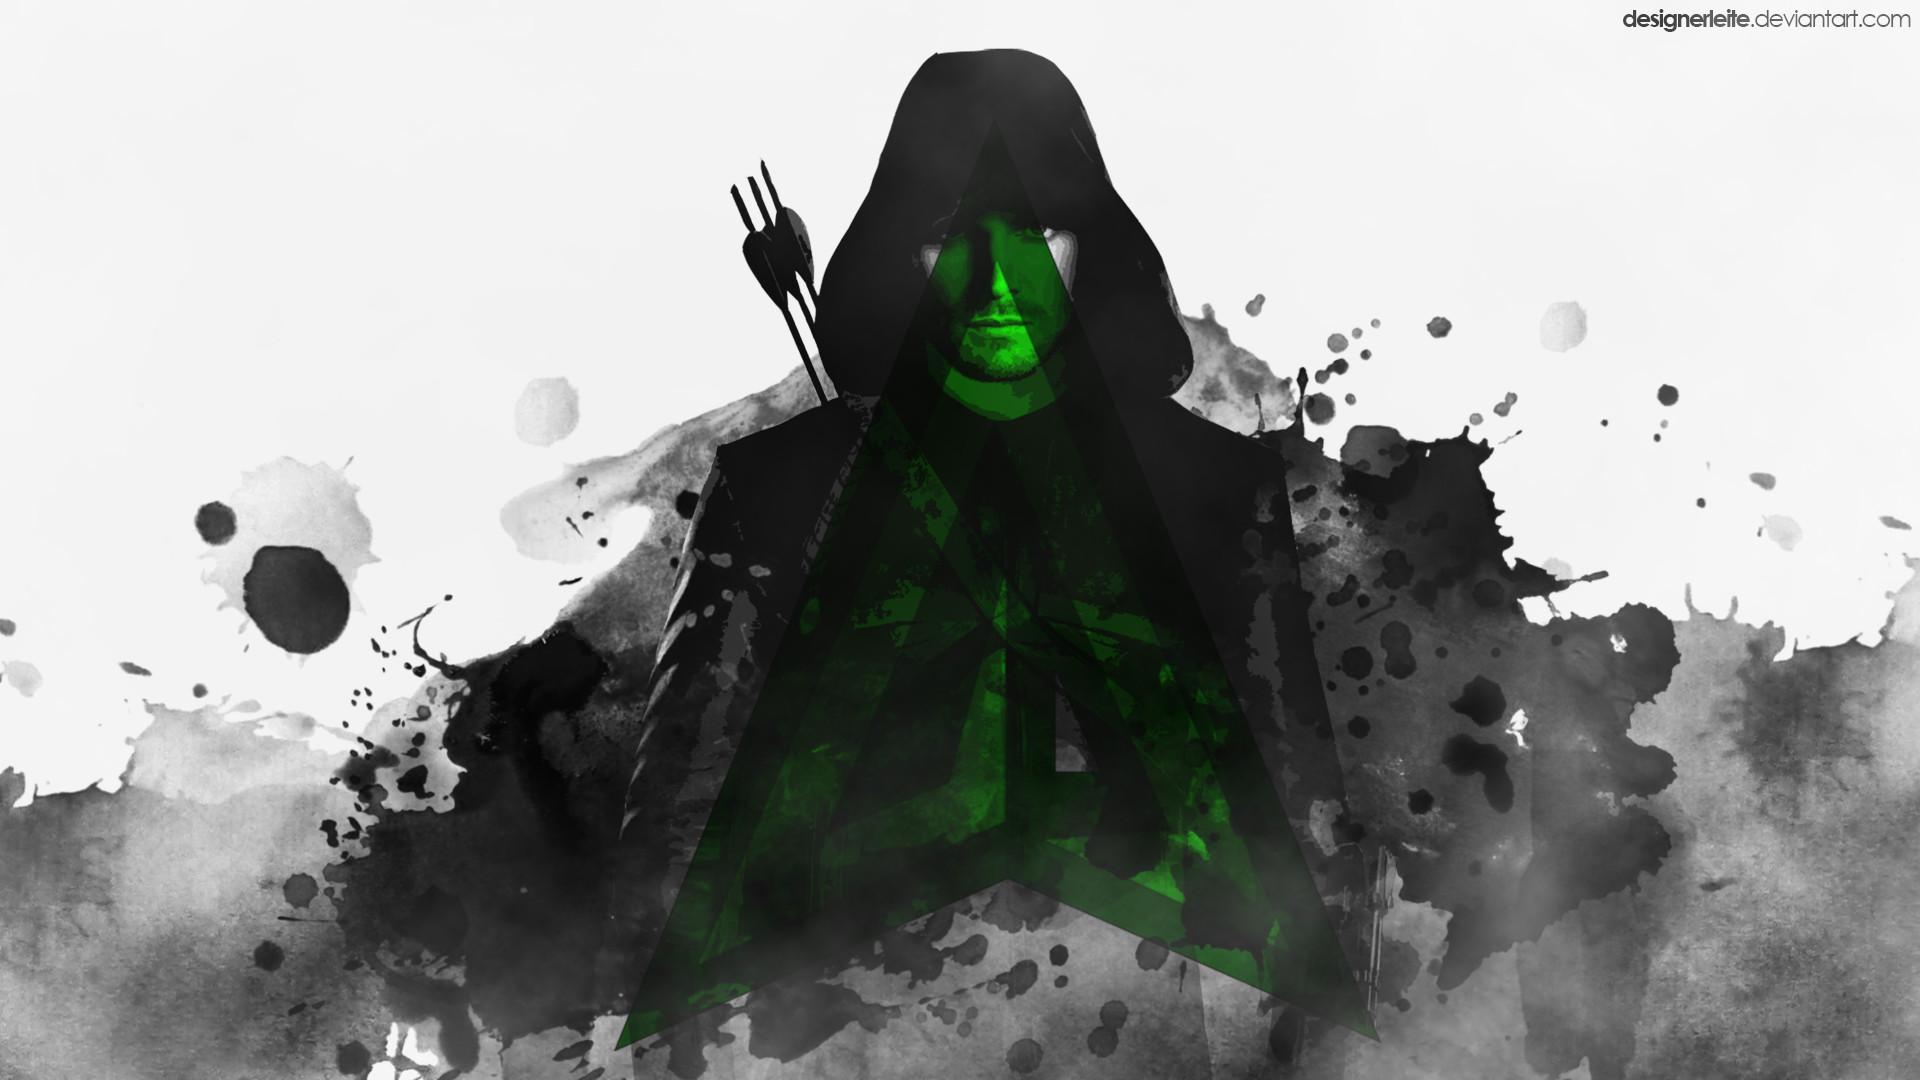 … Green Arrow Wallpaper – Dogukan Senturk by designerleite